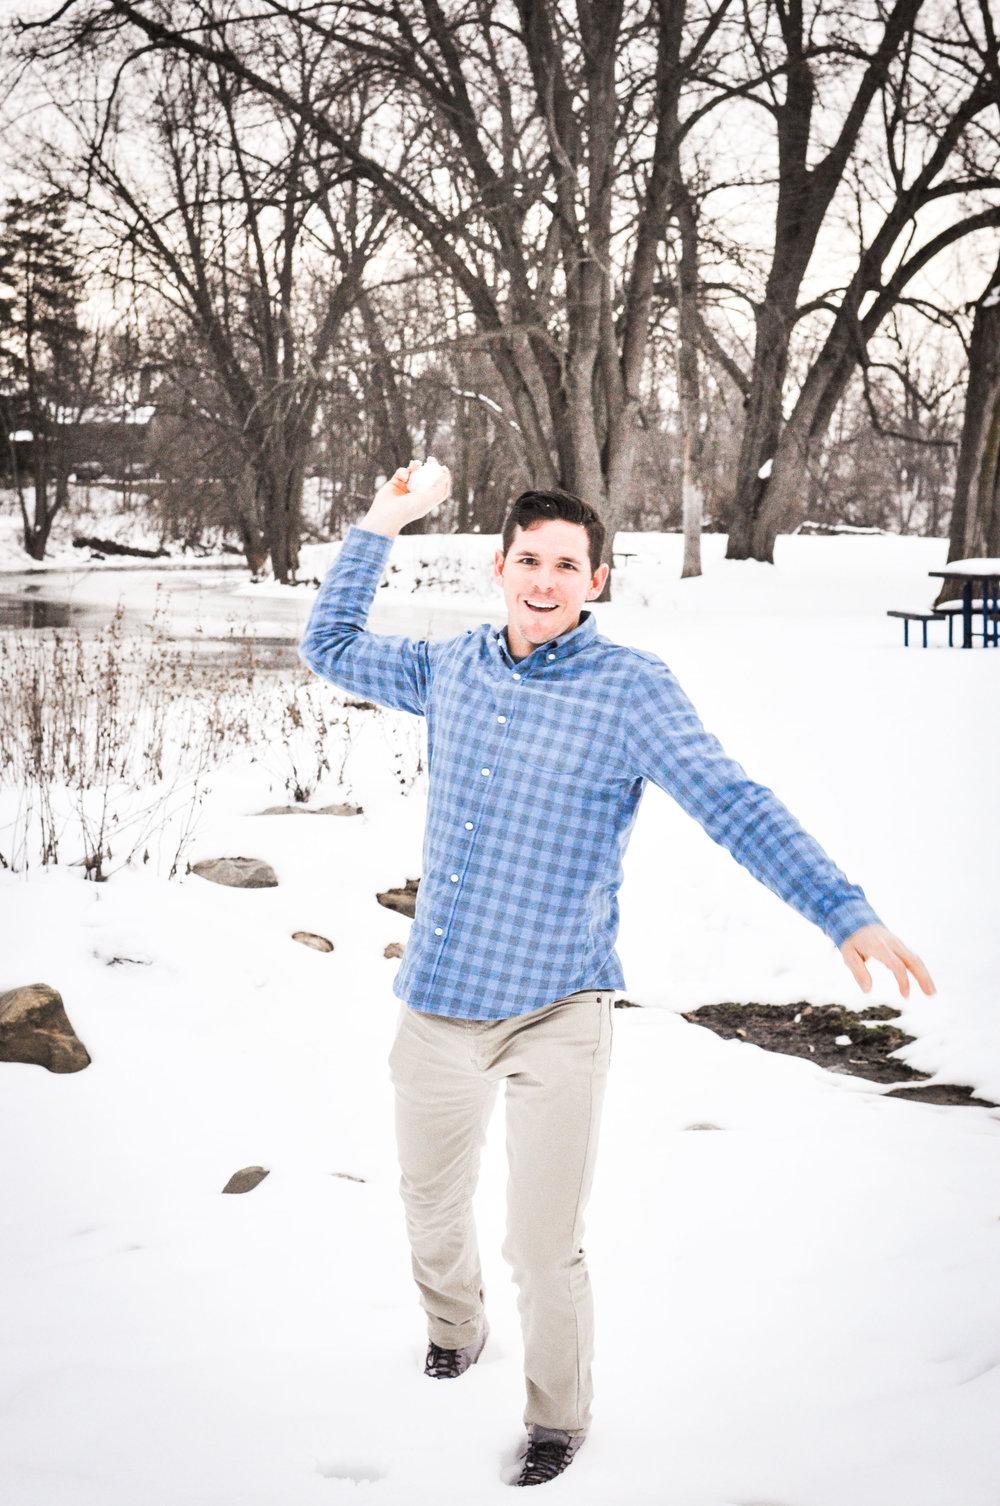 Man in blue shirt throwing snowball